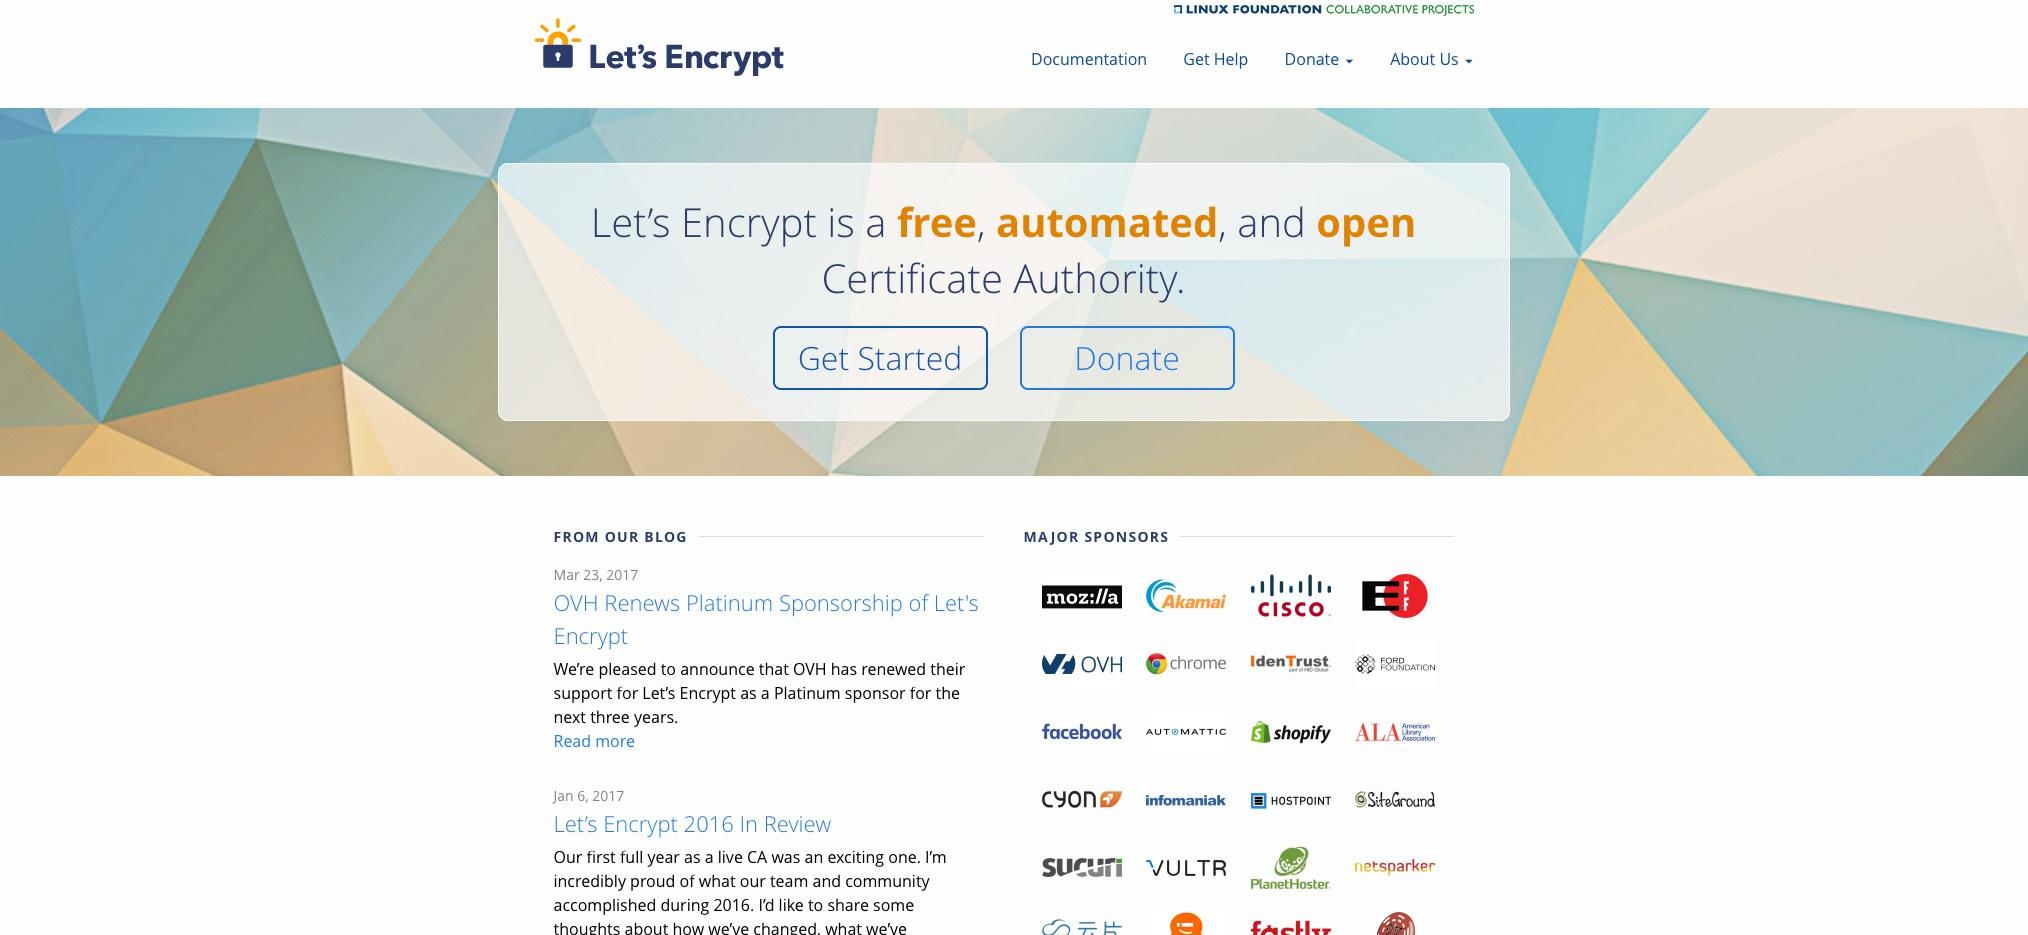 Blend Guide on Let's Encrypt